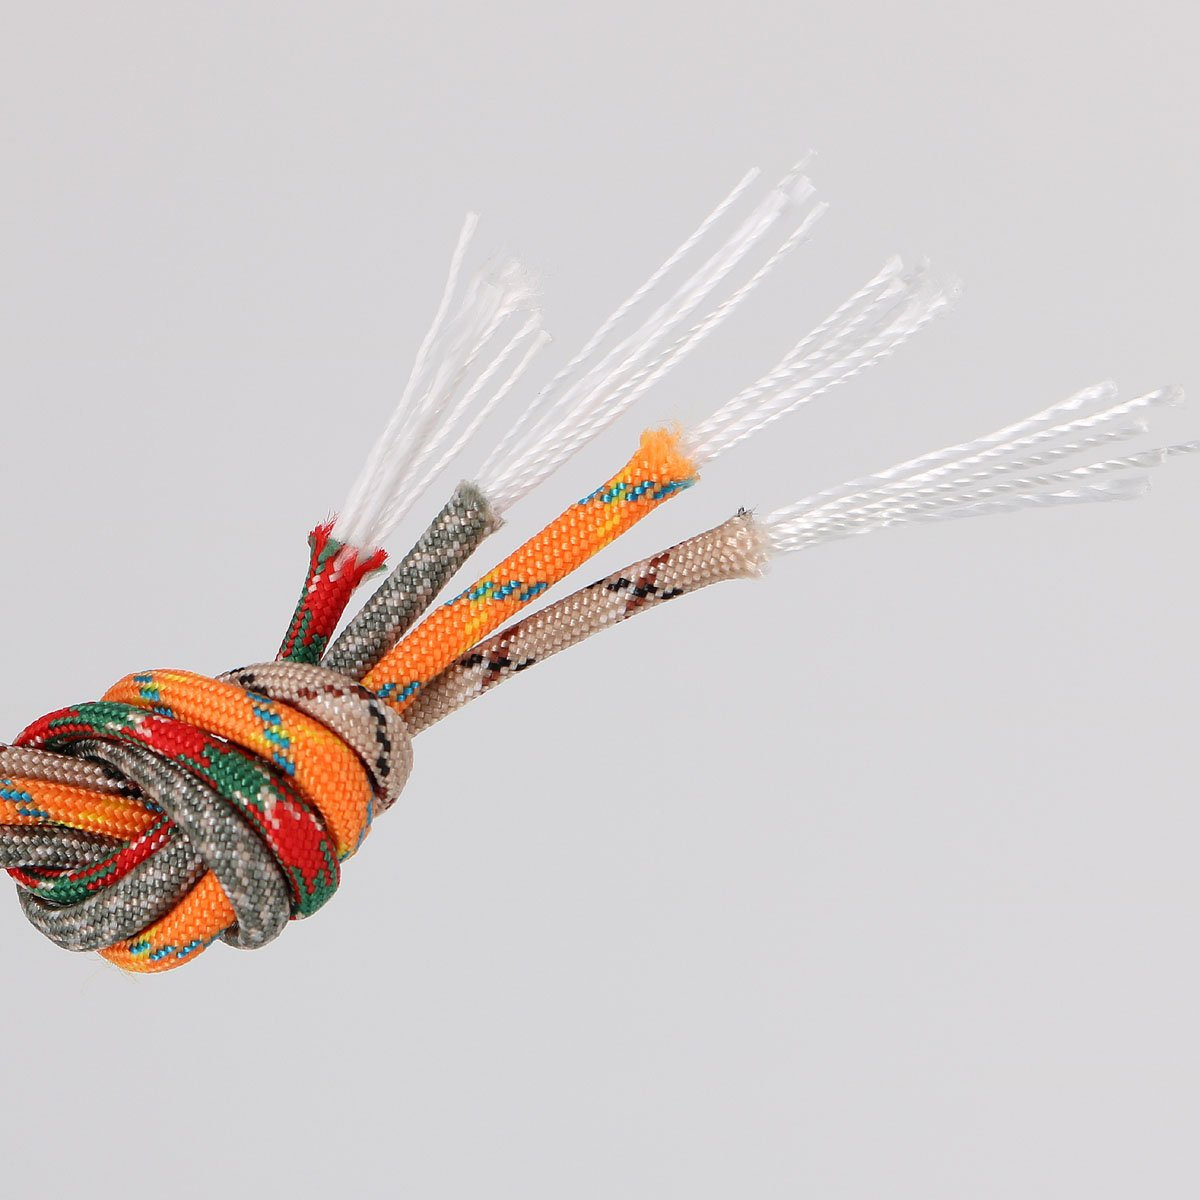 Namvo 550 Luminous Glow in the Dark Paracord Mil Spec Type III 7 strand parachute cord Pink 100ft 30 Meters